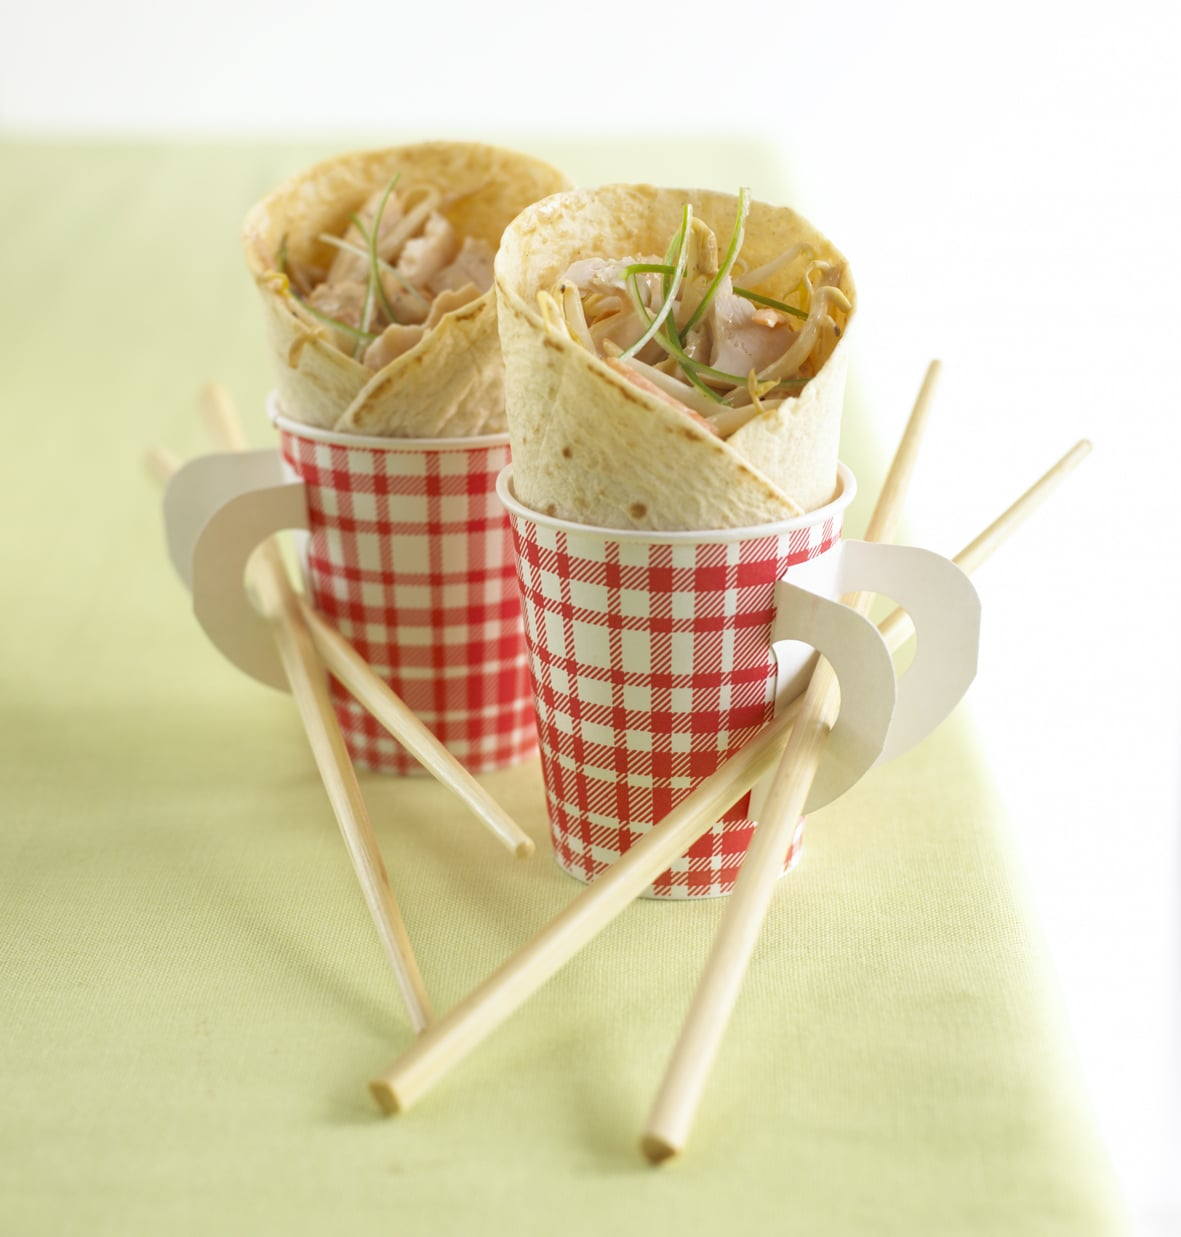 Chinese Chicken Wrap